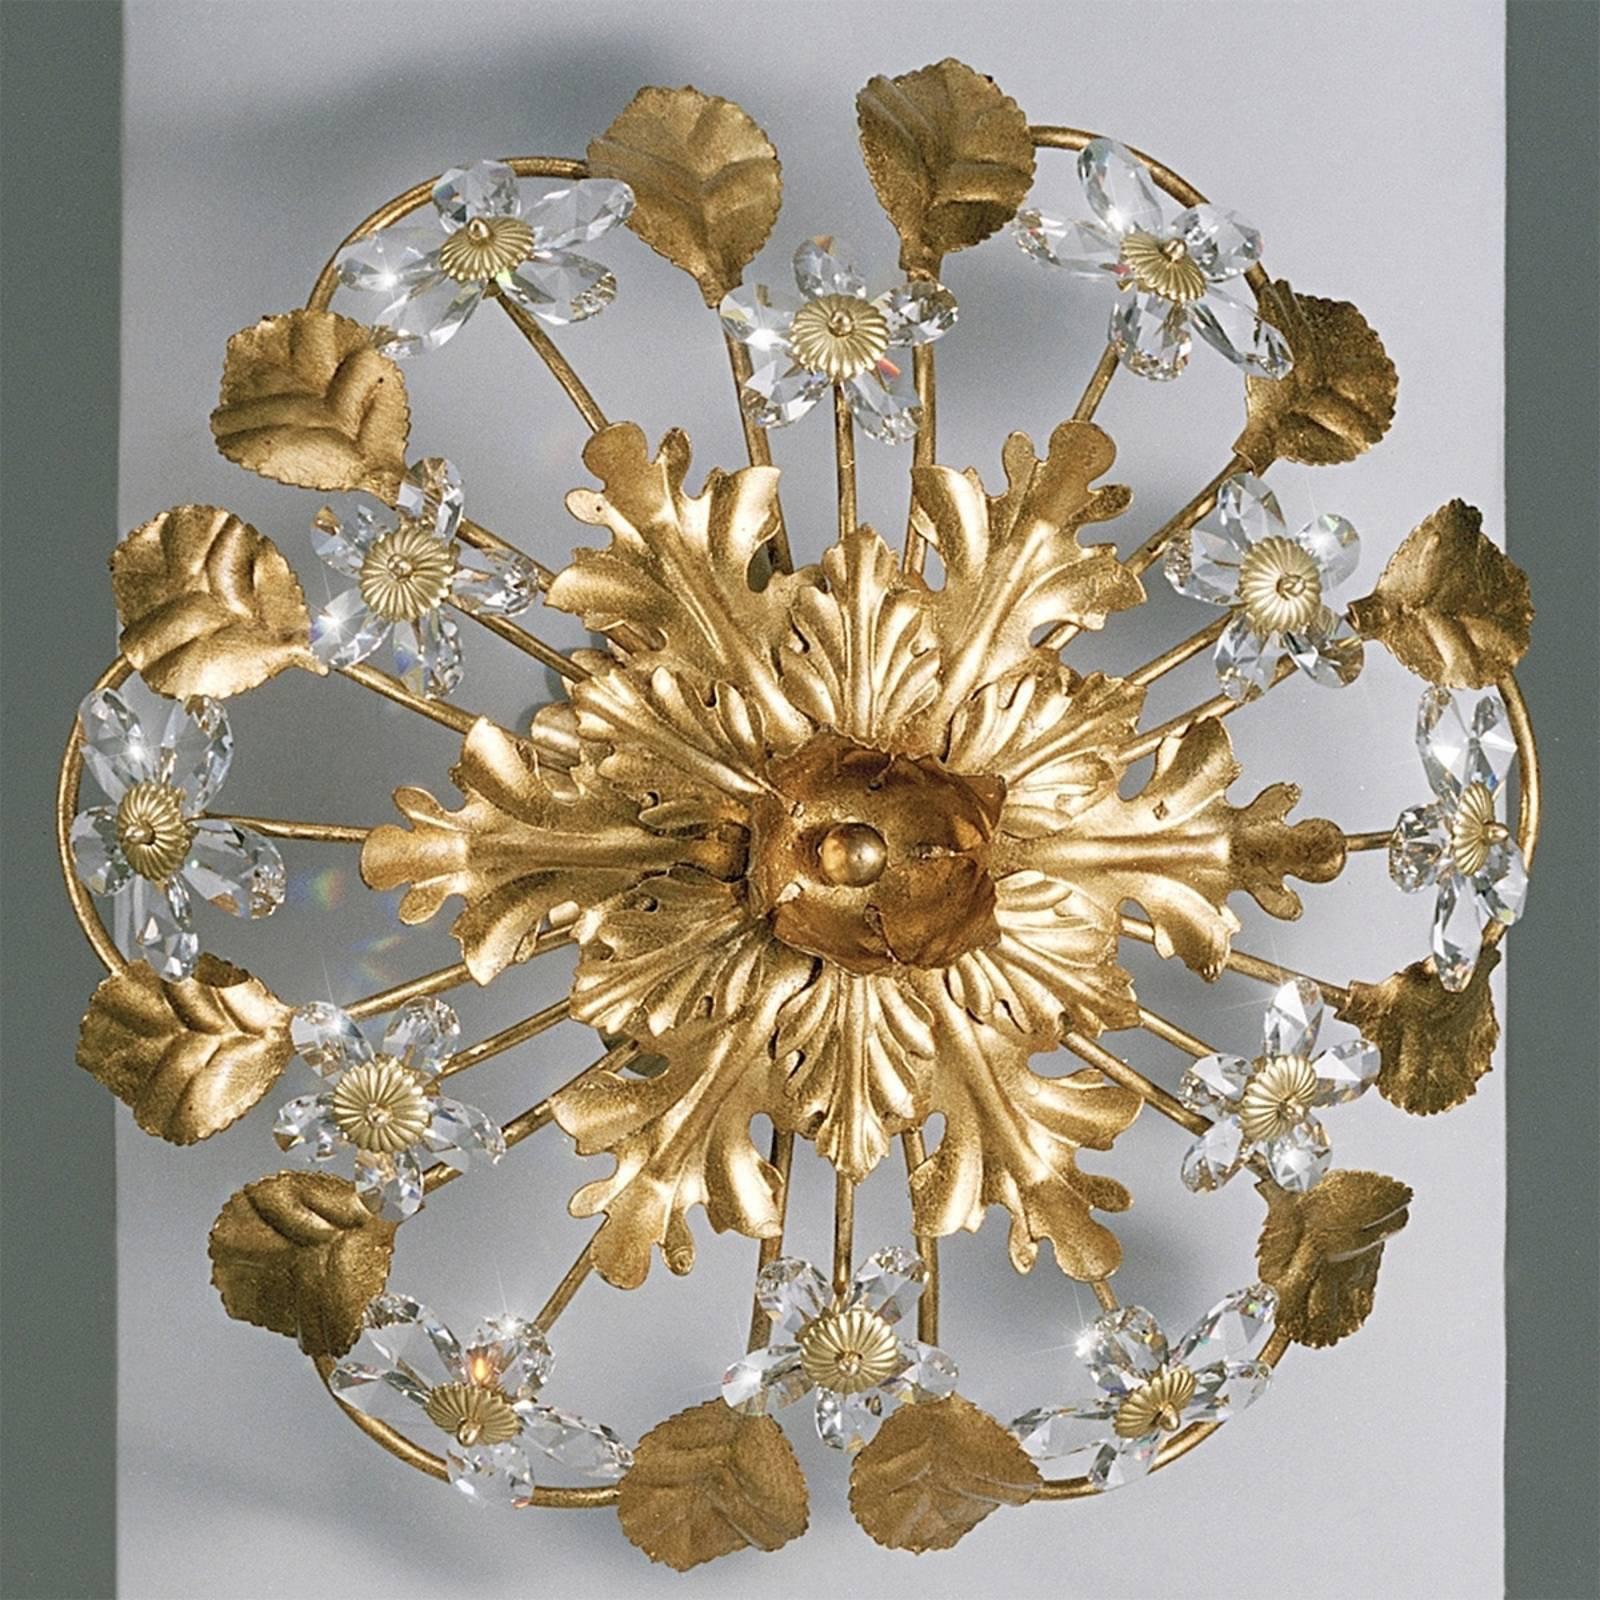 AREZZO taklampe med glassblomster